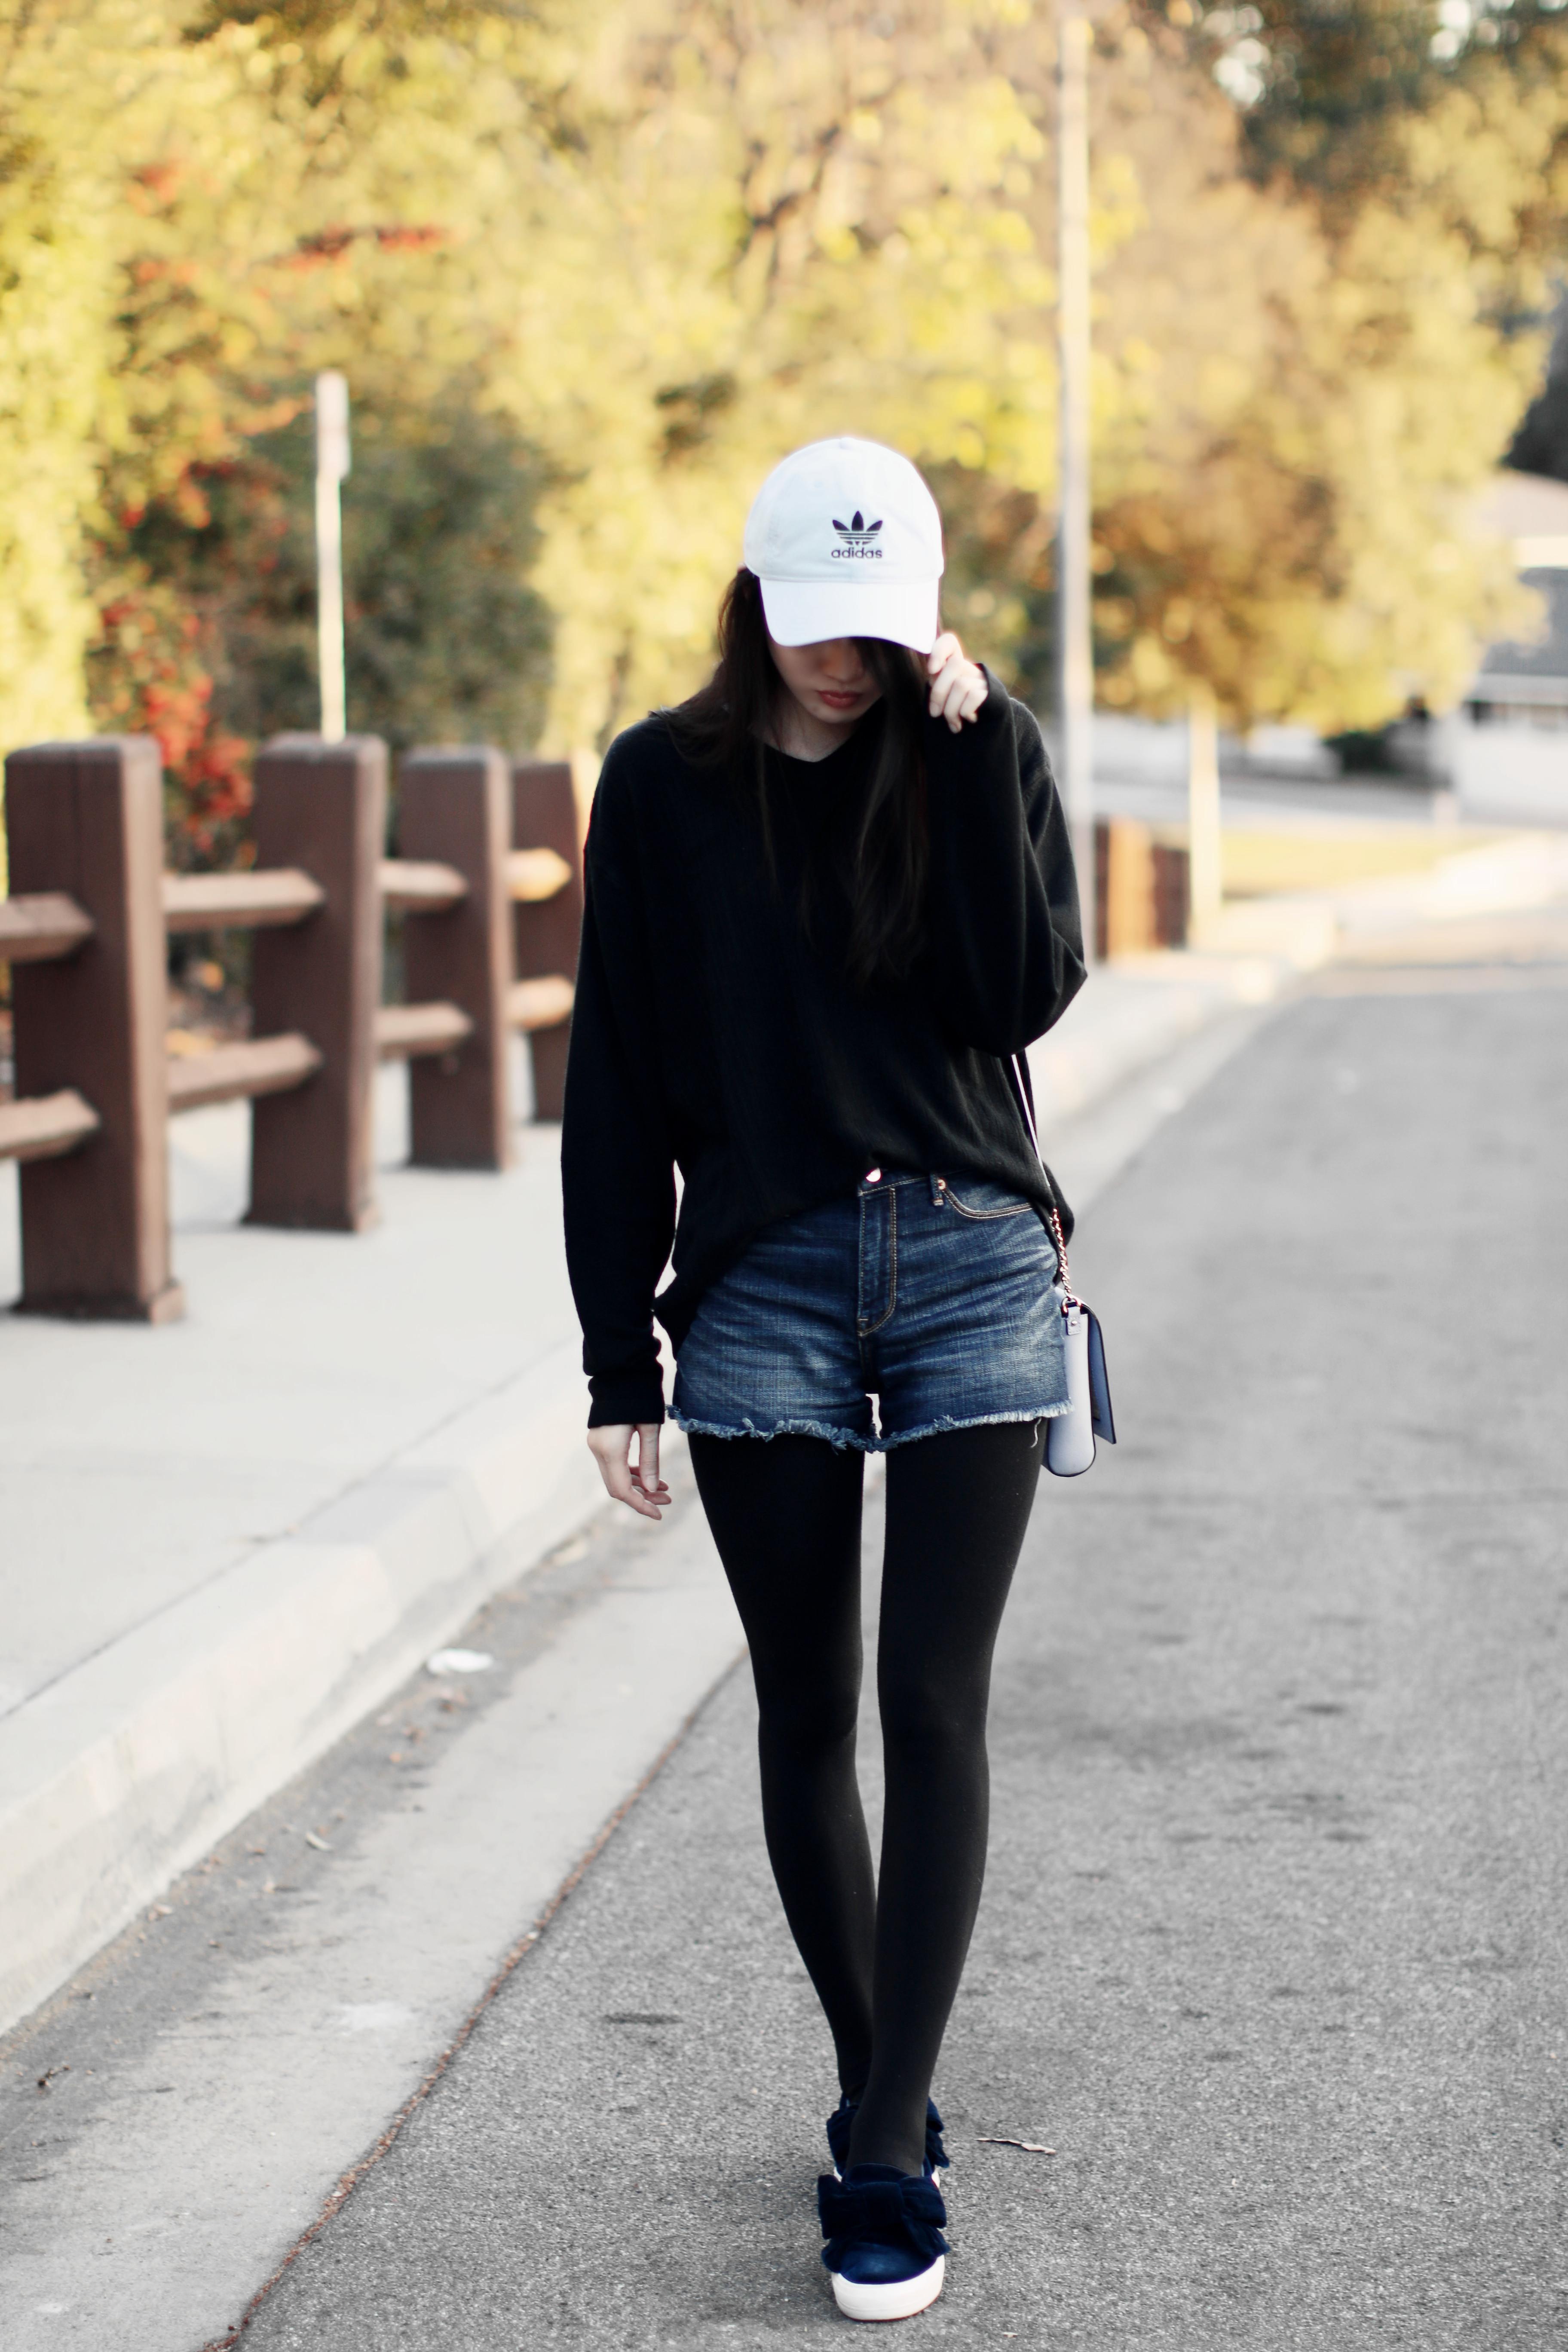 4372-ootd-fashion-style-outfitoftheday-wiwt-streetstyle-adidas-urbanoutfitters-hm-f21xme-nike-elizabeeetht-clothestoyouuu